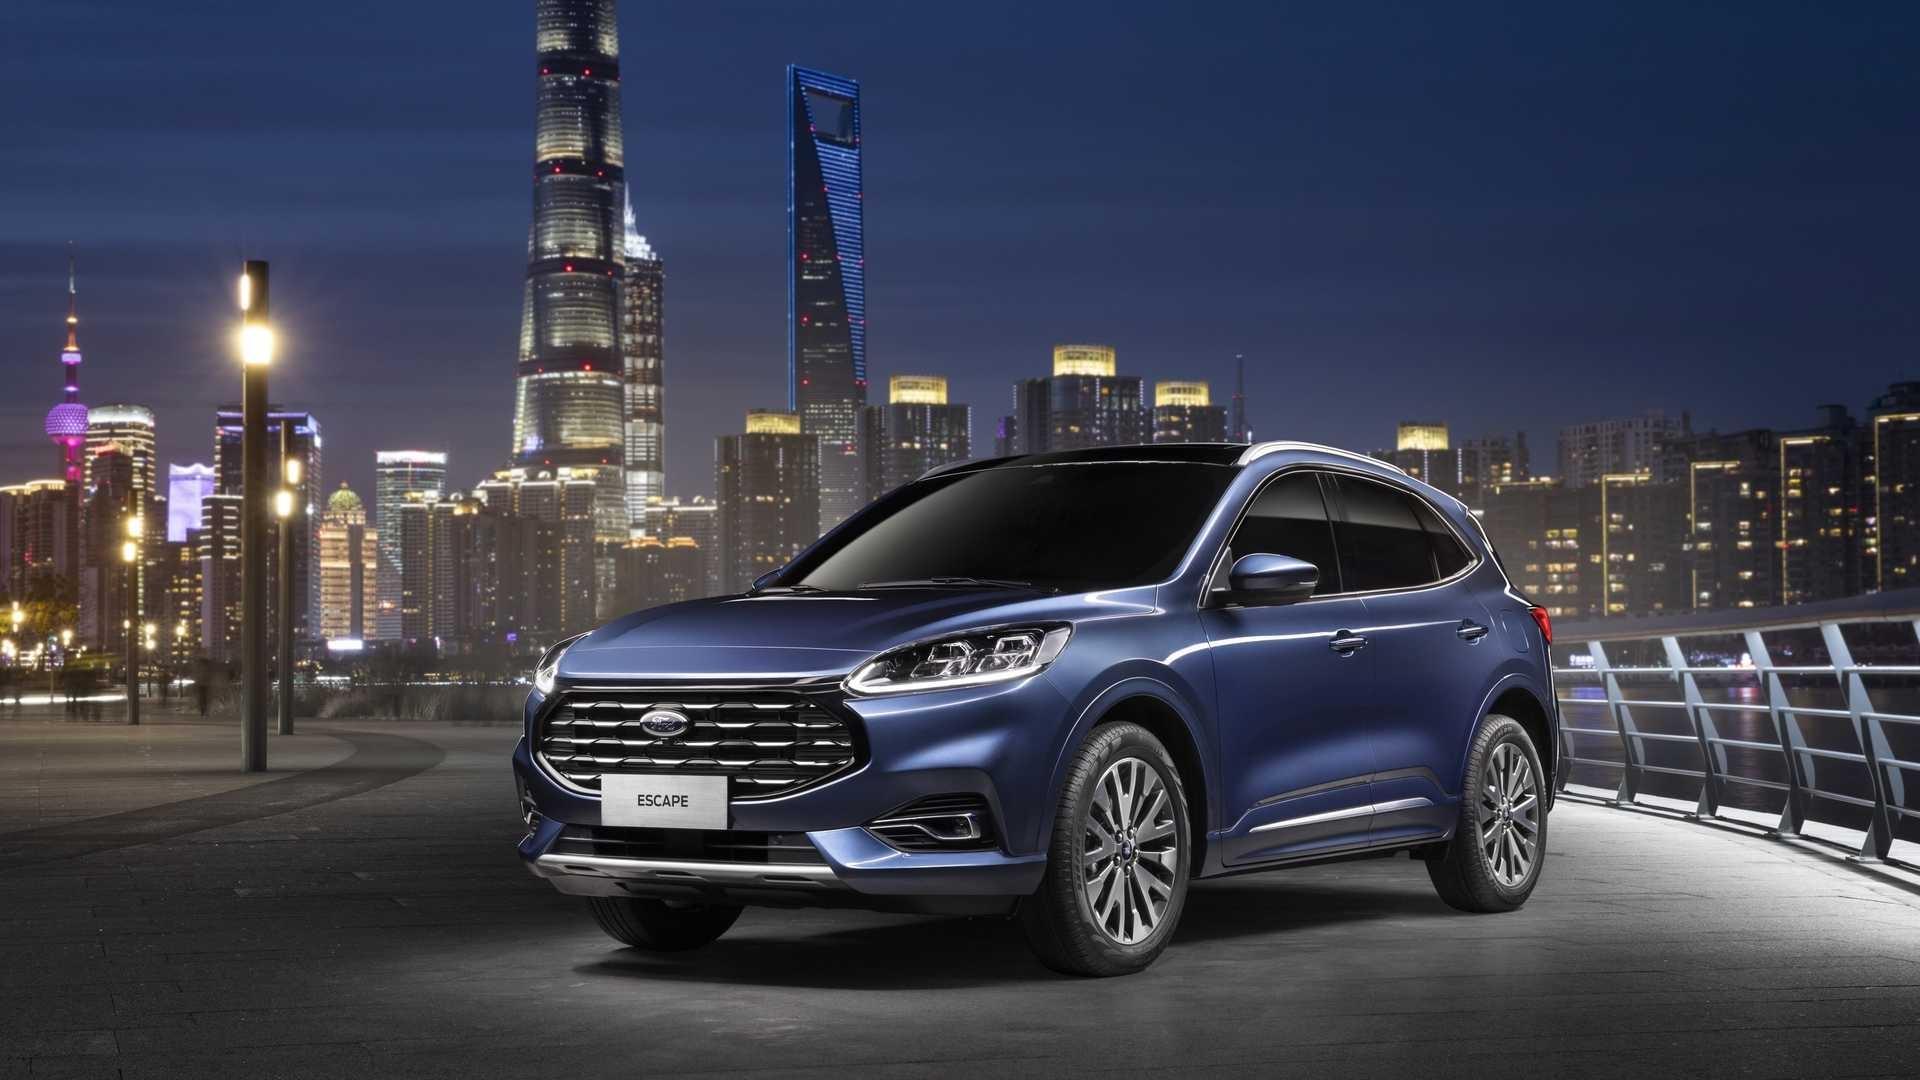 All new kuga - Ford(第5頁) - 汽車討論區 - Mobile01